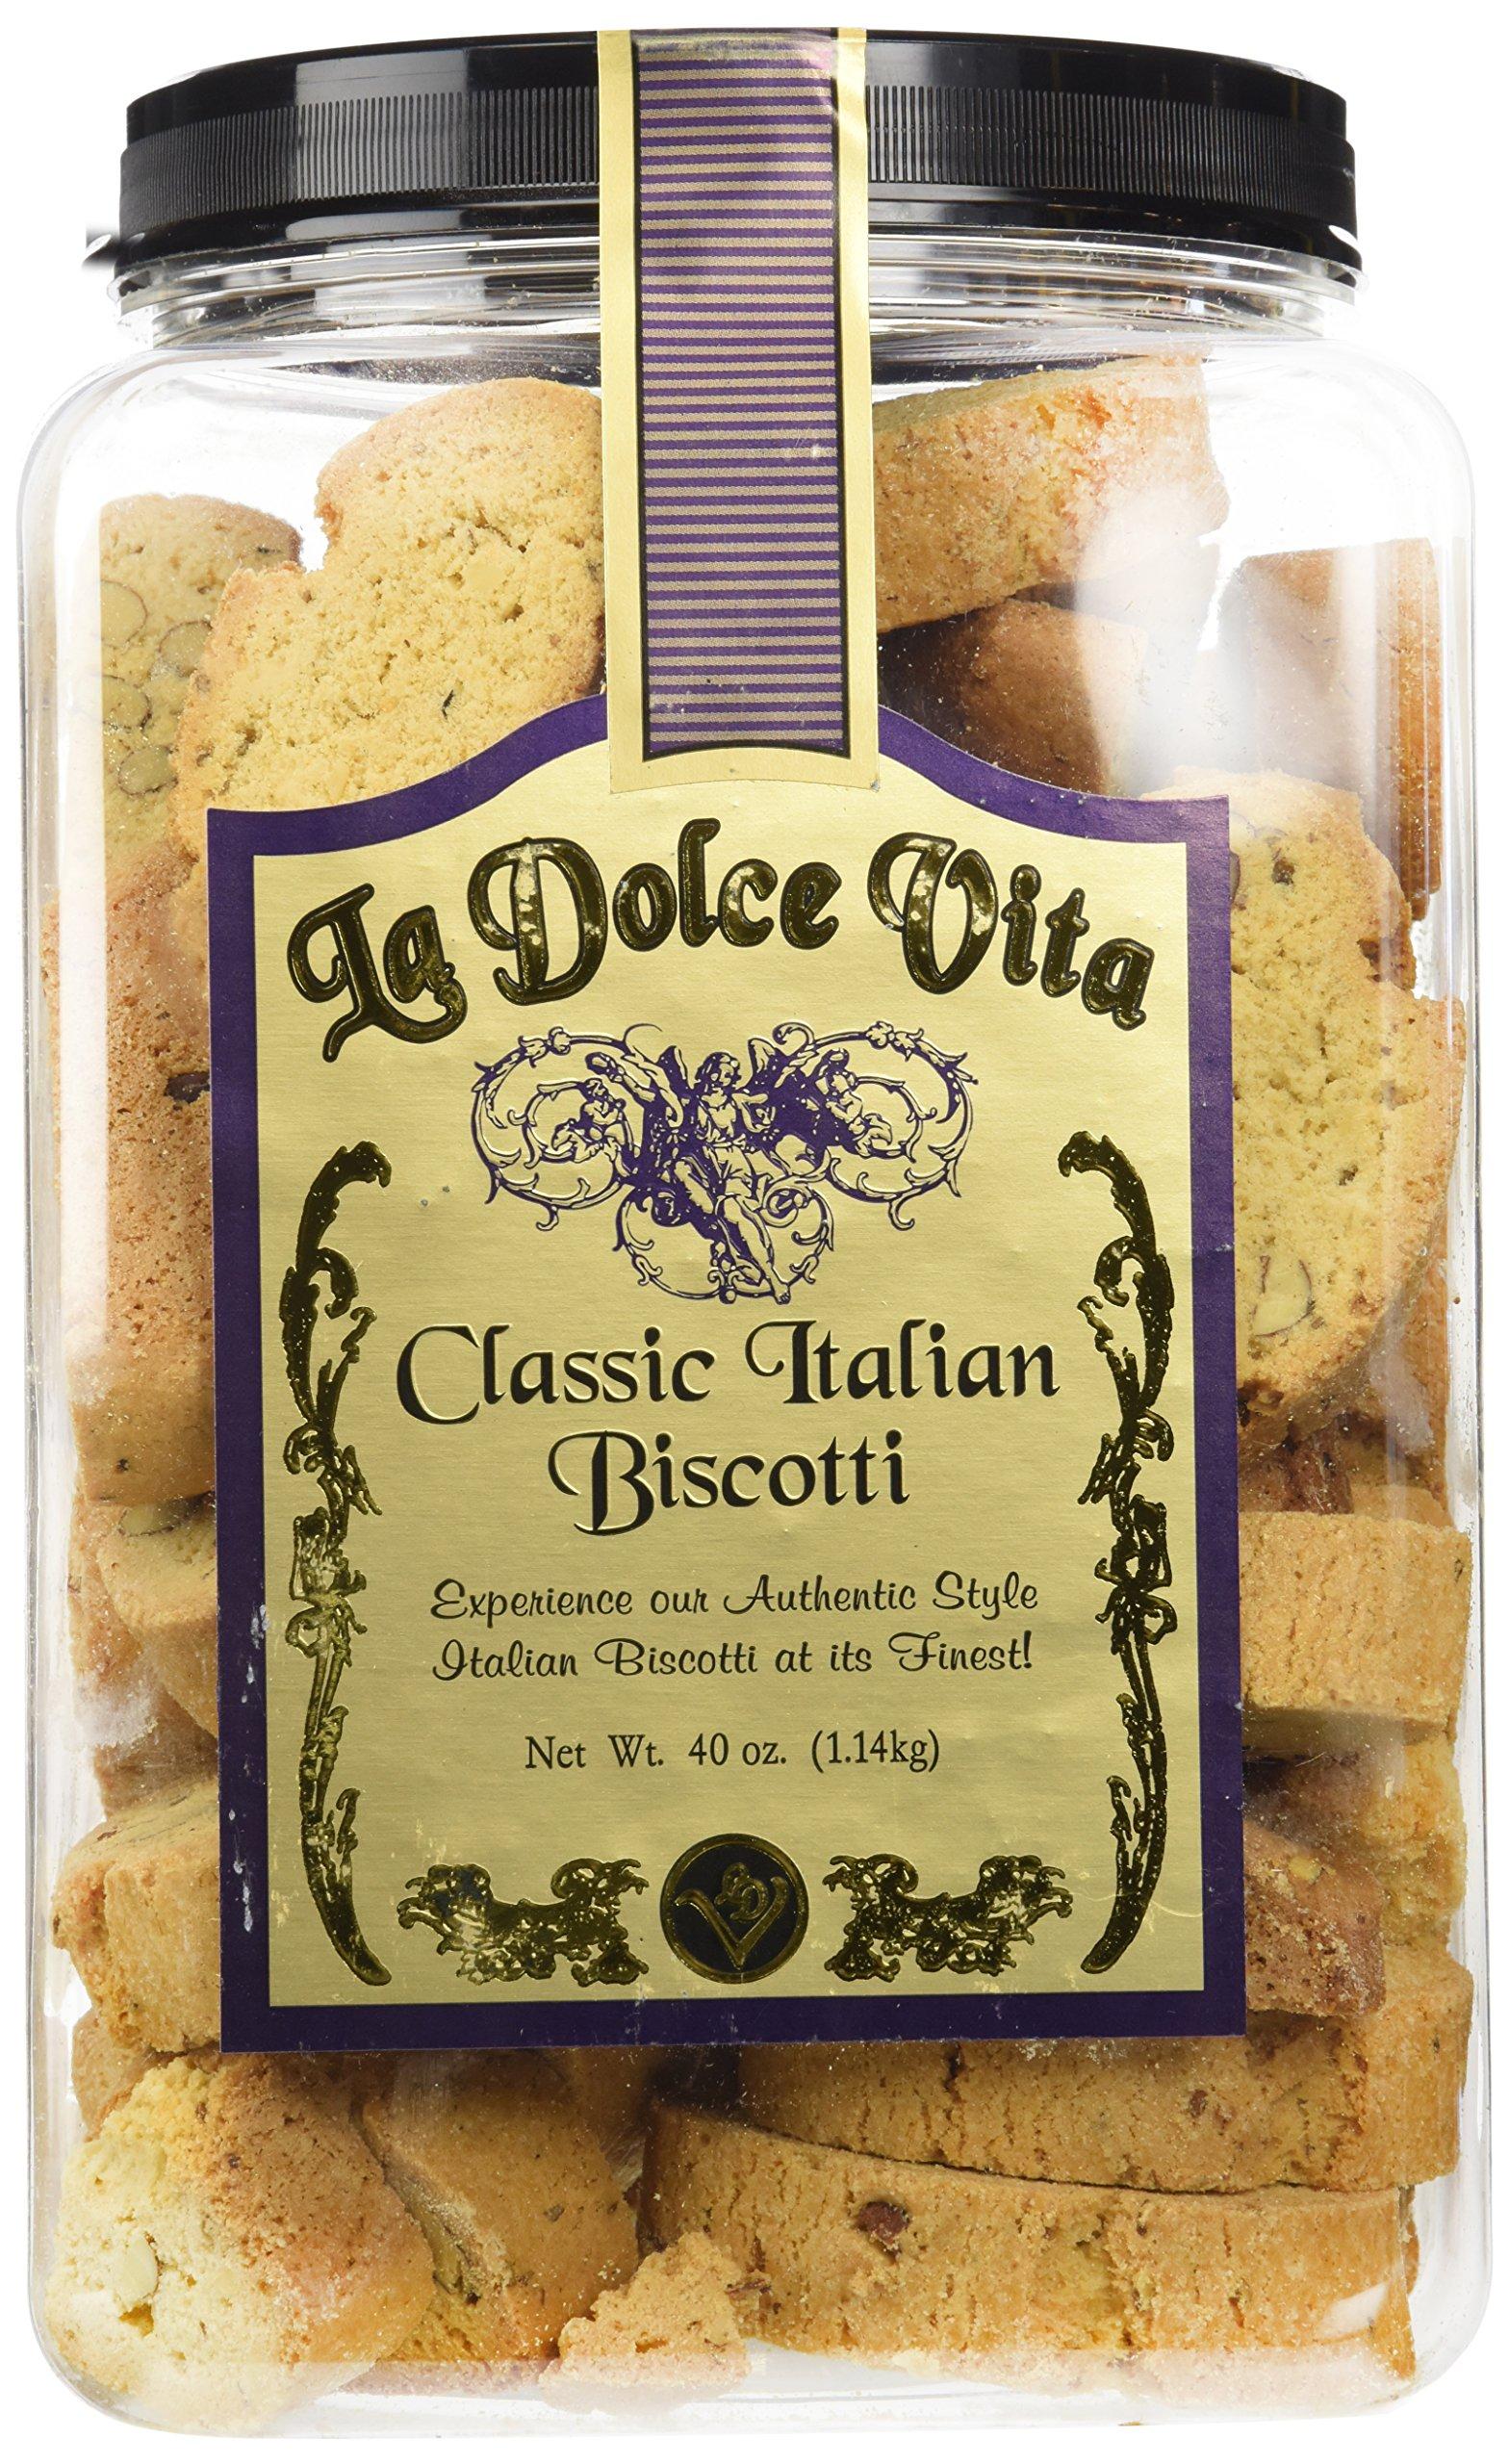 Fresh La Dolce Vita Classic Italian Biscotti 40 Oz of JAR by Dolce Vita